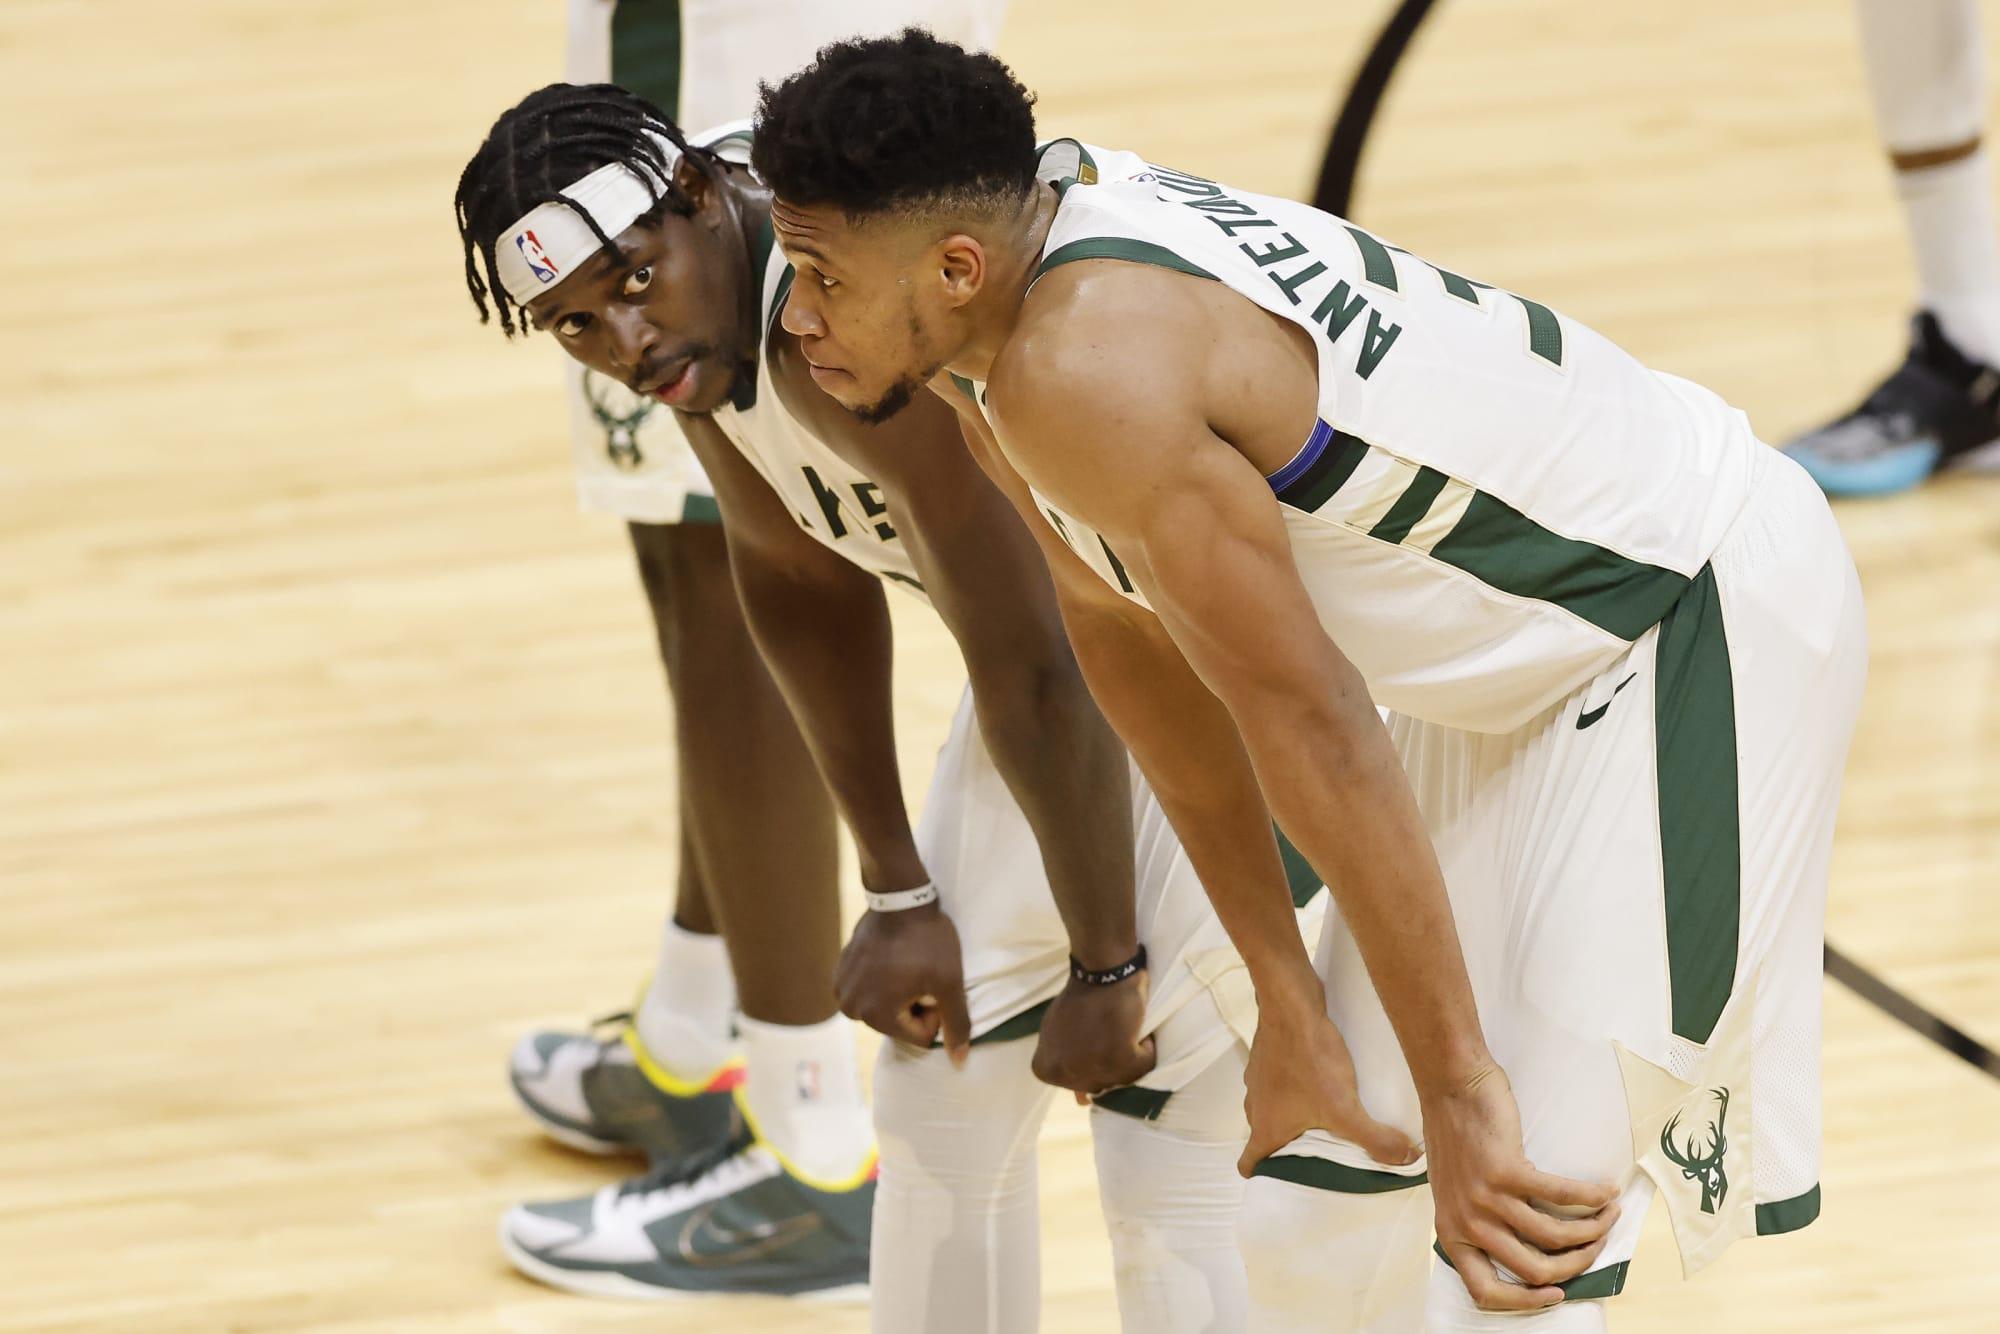 Milwaukee Bucks superstars contemplate defeating Phoenix Suns